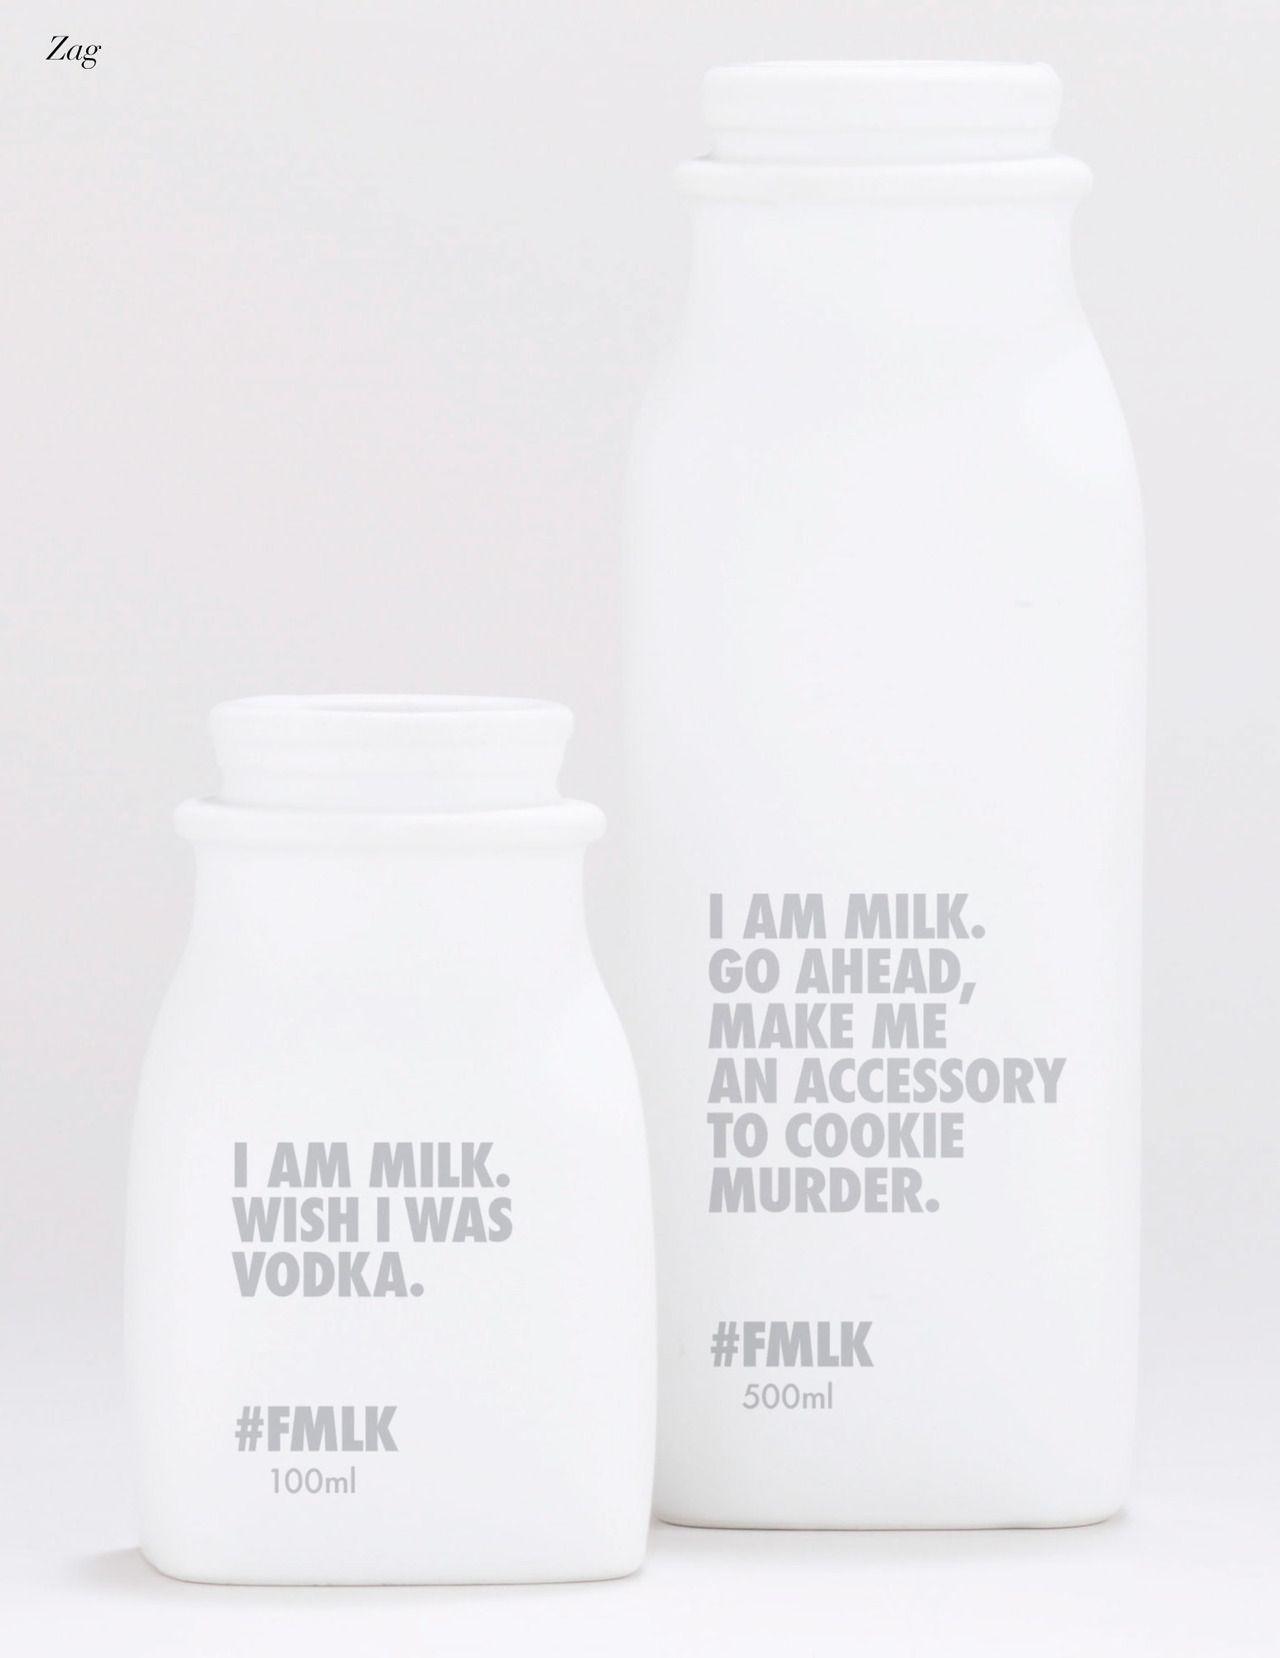 I am milk. Wish i was Vodka - Milk packaging FMLK